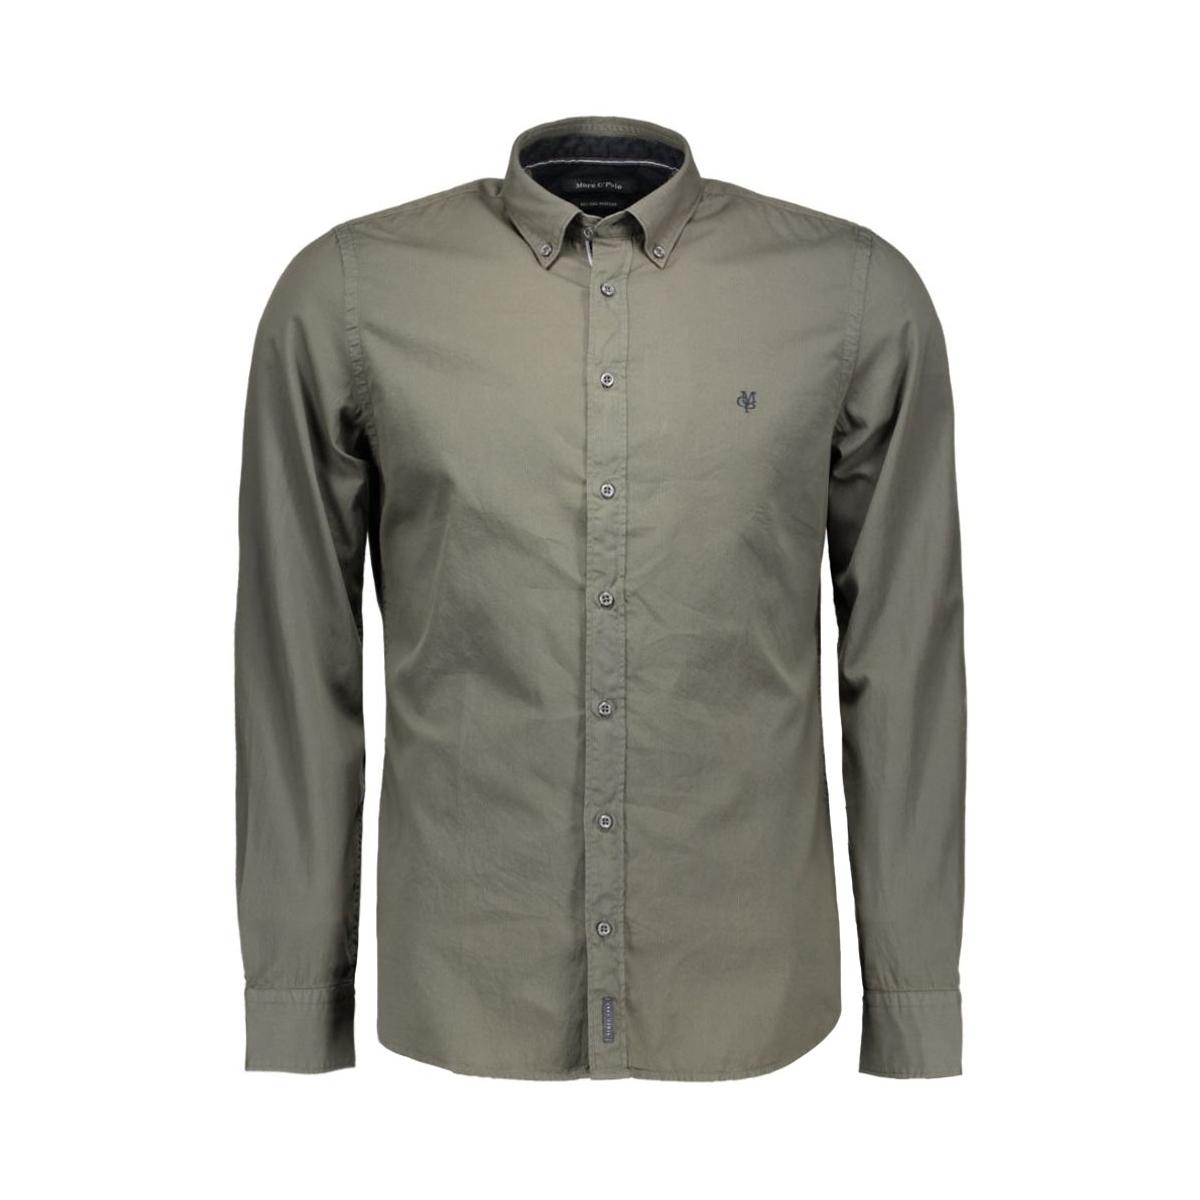 s27 1668 42076 marc o`polo overhemd 492 olive